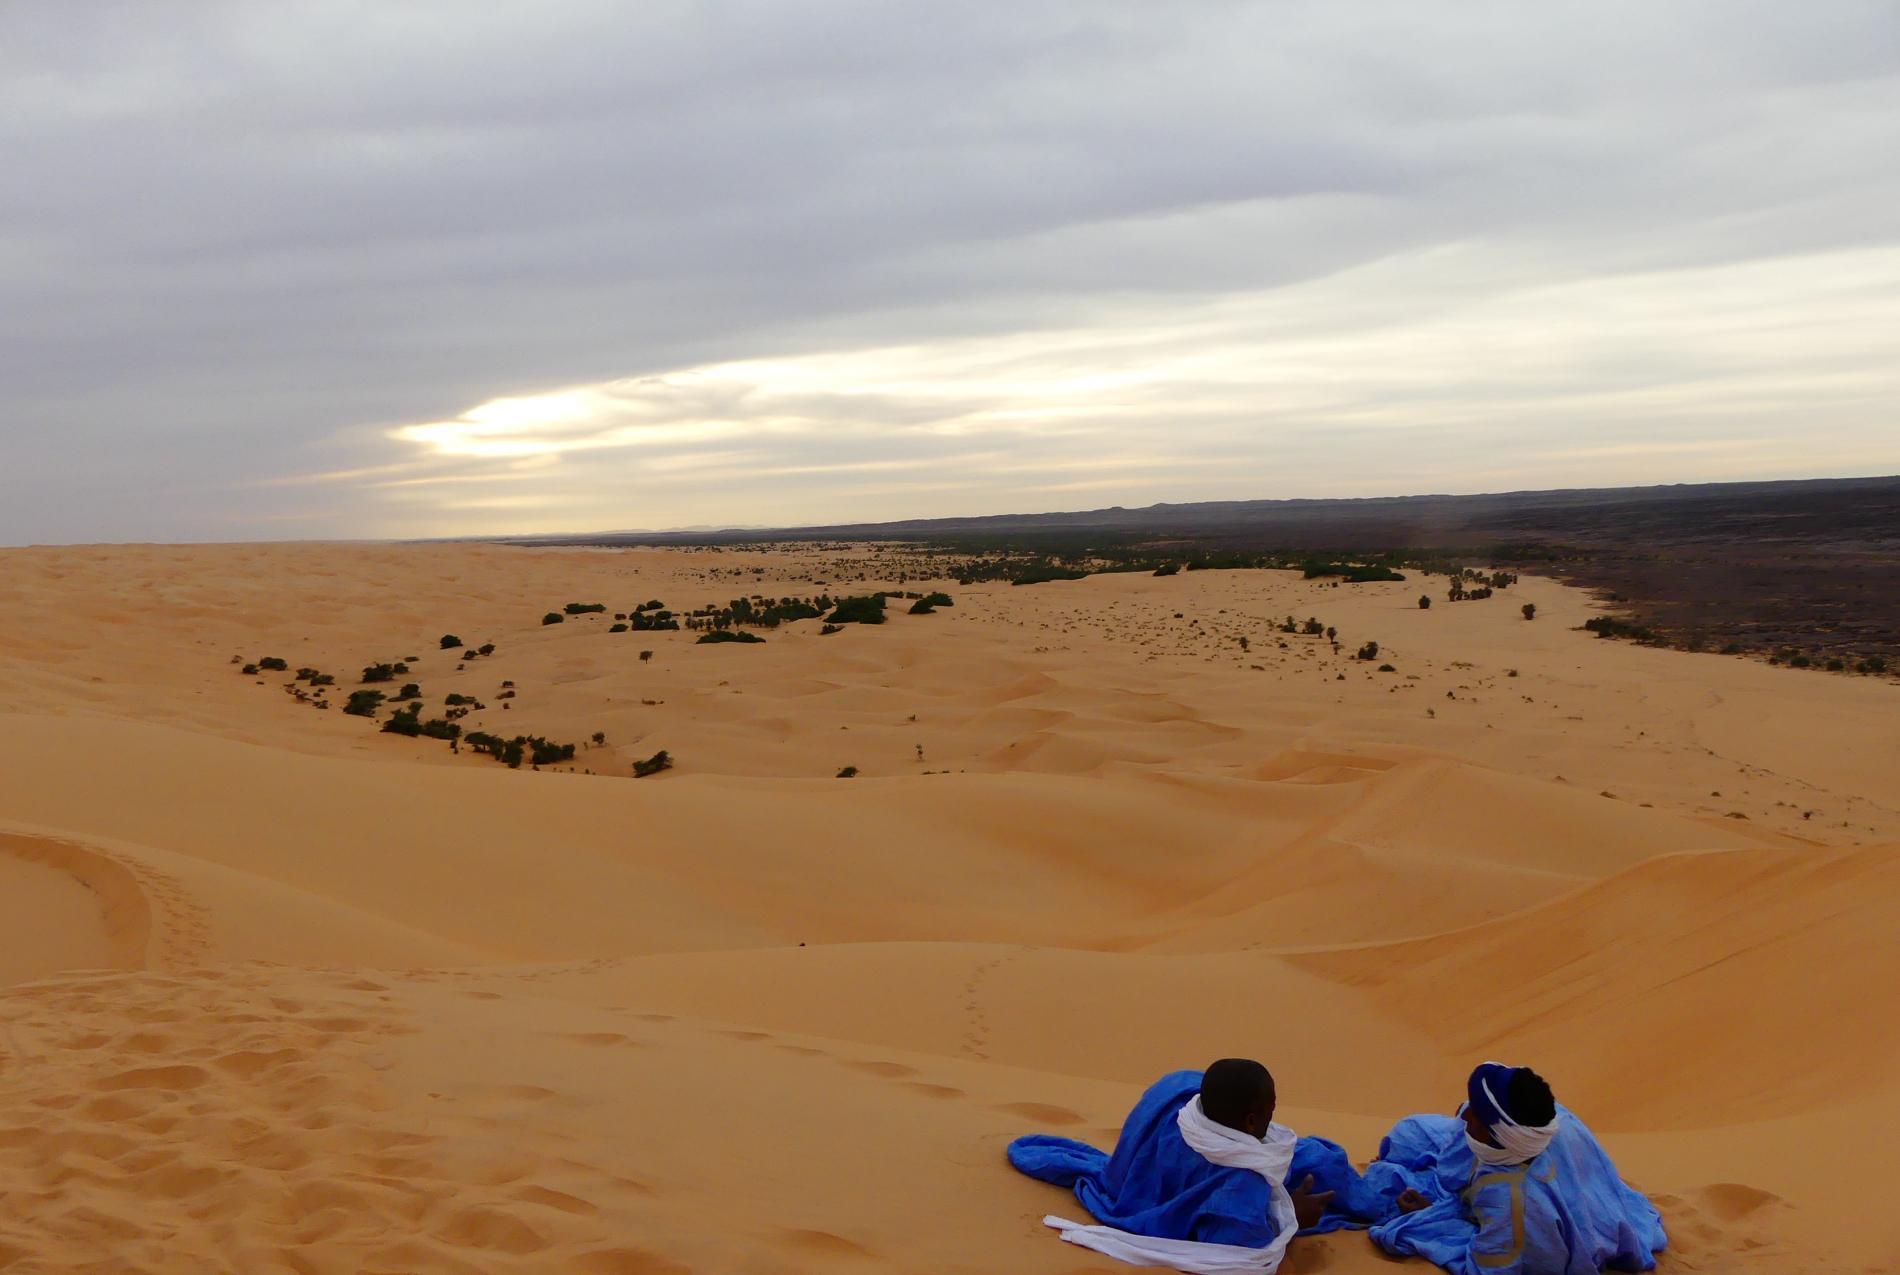 Voyage solidaire Mauritanie : Vision du Monde - Photo 7